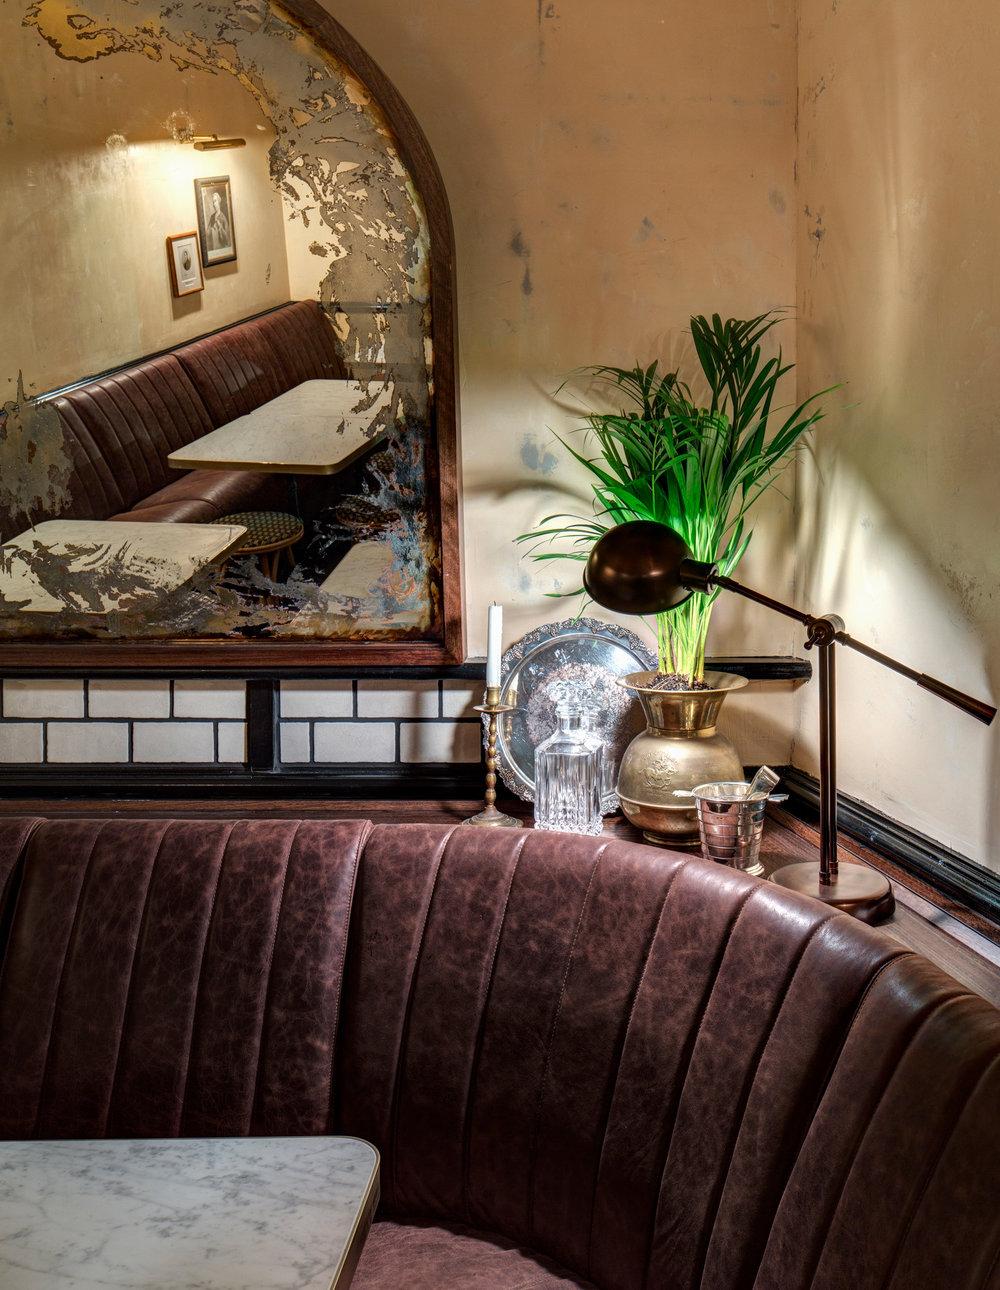 Jem_Cresswell_Architecture_Hospitality_Photographer_Sydney_Australia_020.jpg